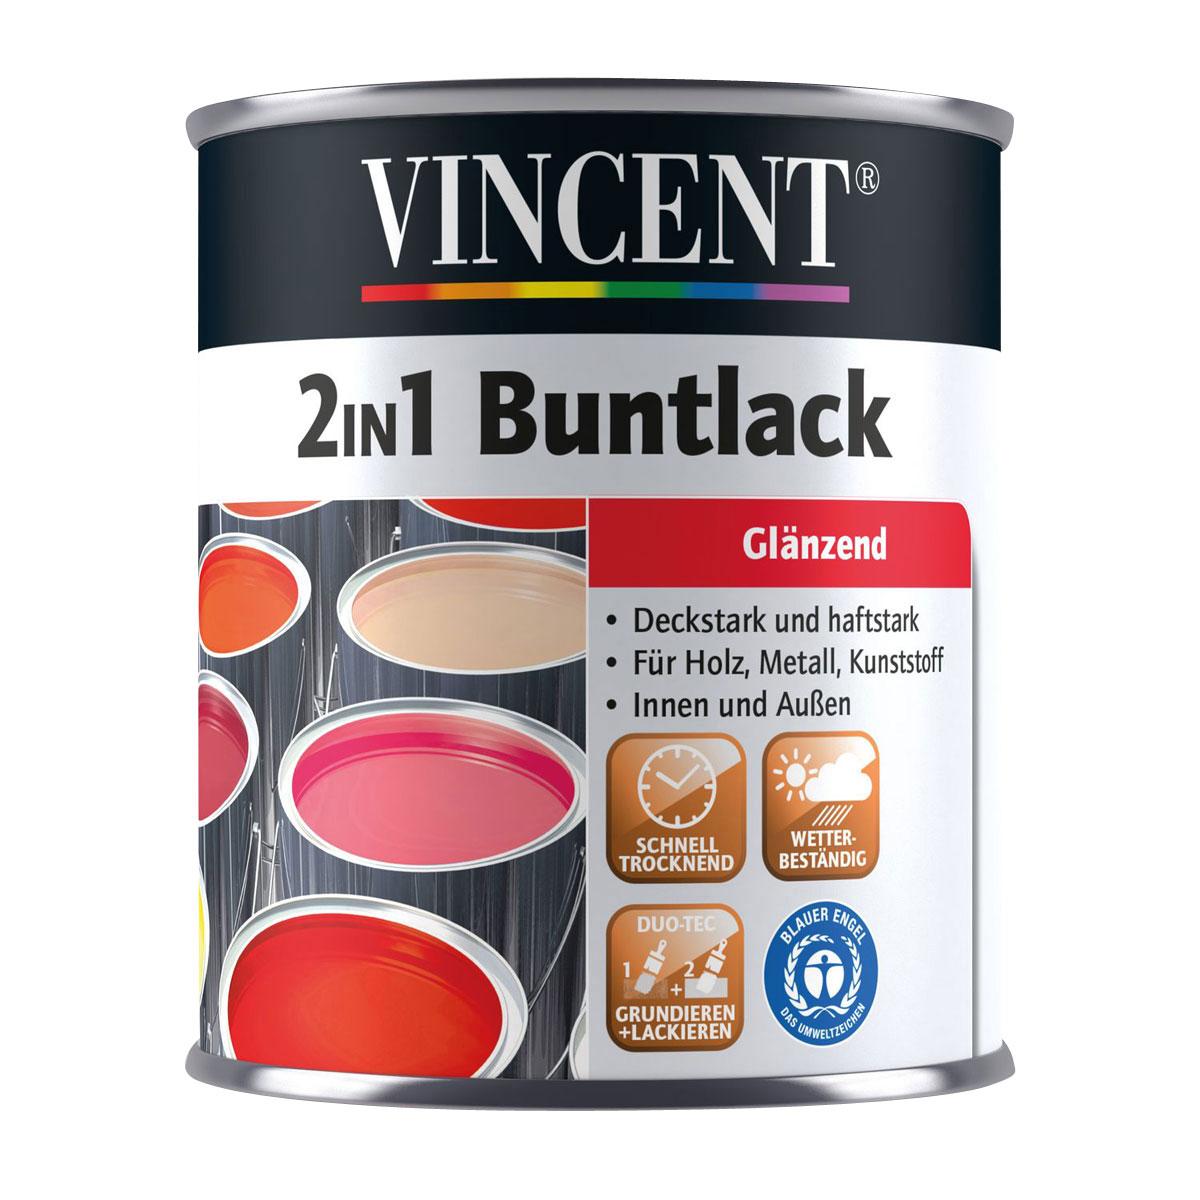 Vincent 2in1 Buntlack reinweiß